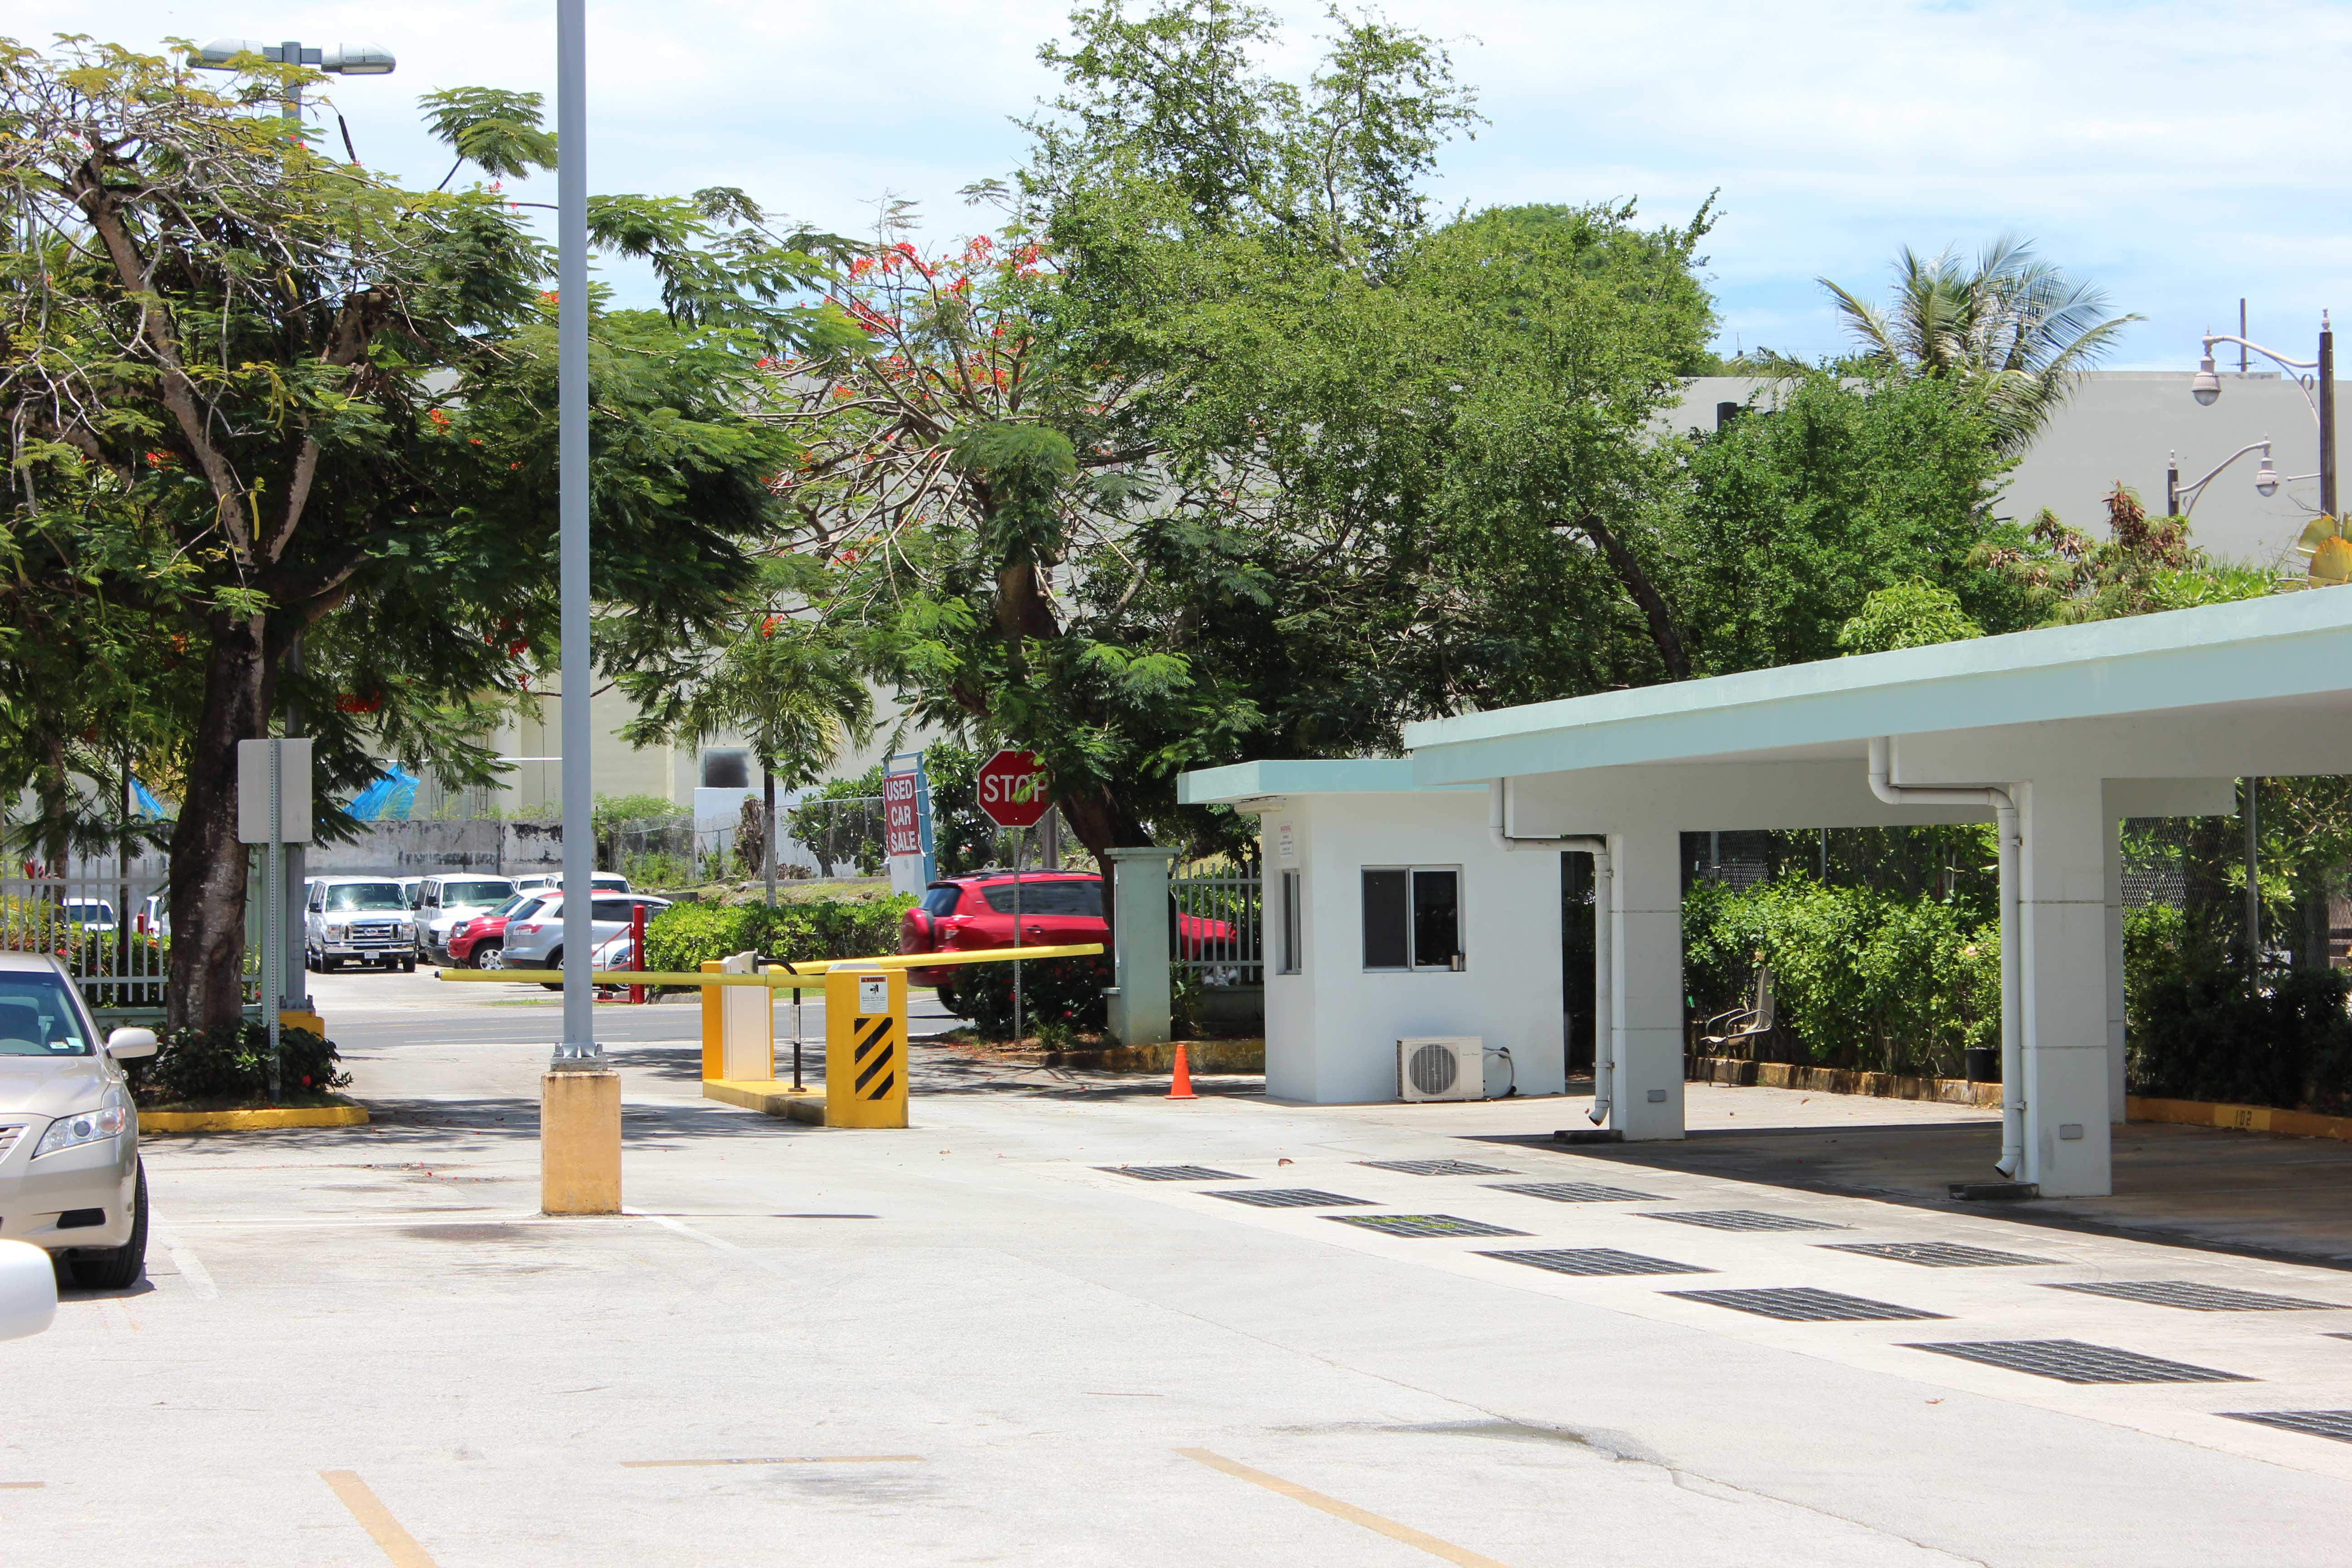 Guam-Beachfront-Residences-Gated-Entry